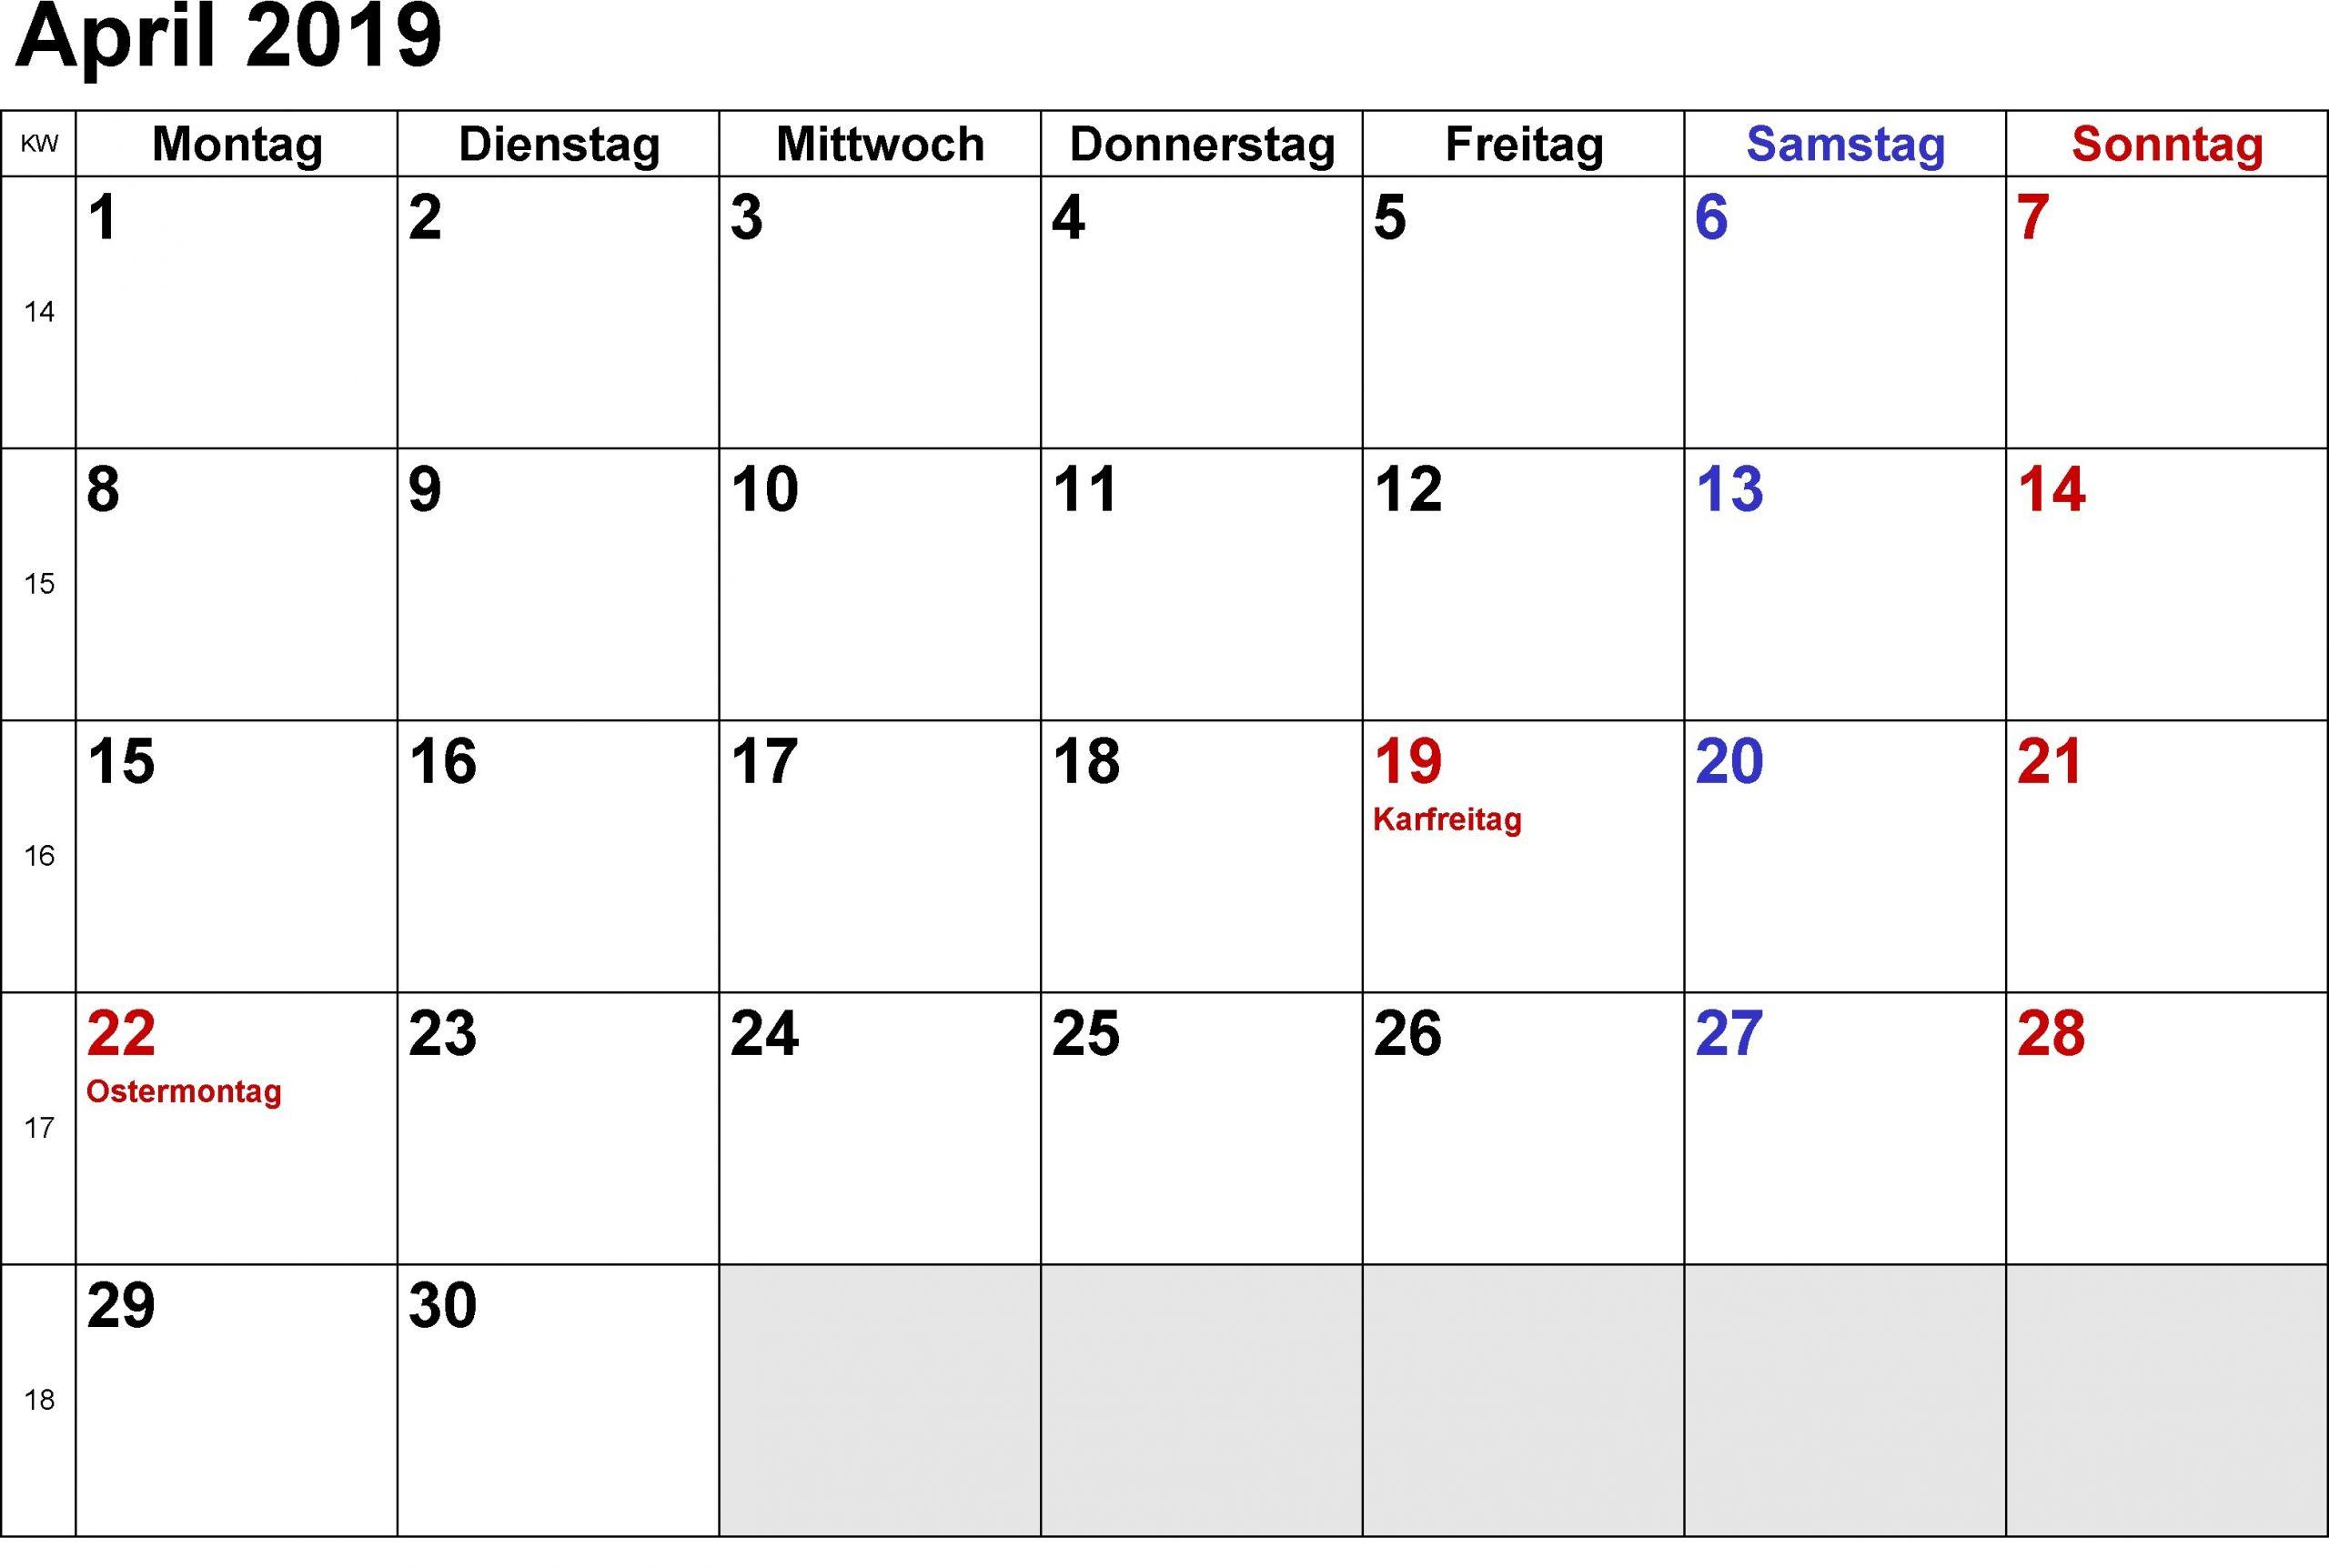 kalender 2019 excel erstellen mas actual april steht im kalender of kalender 2019 excel erstellen